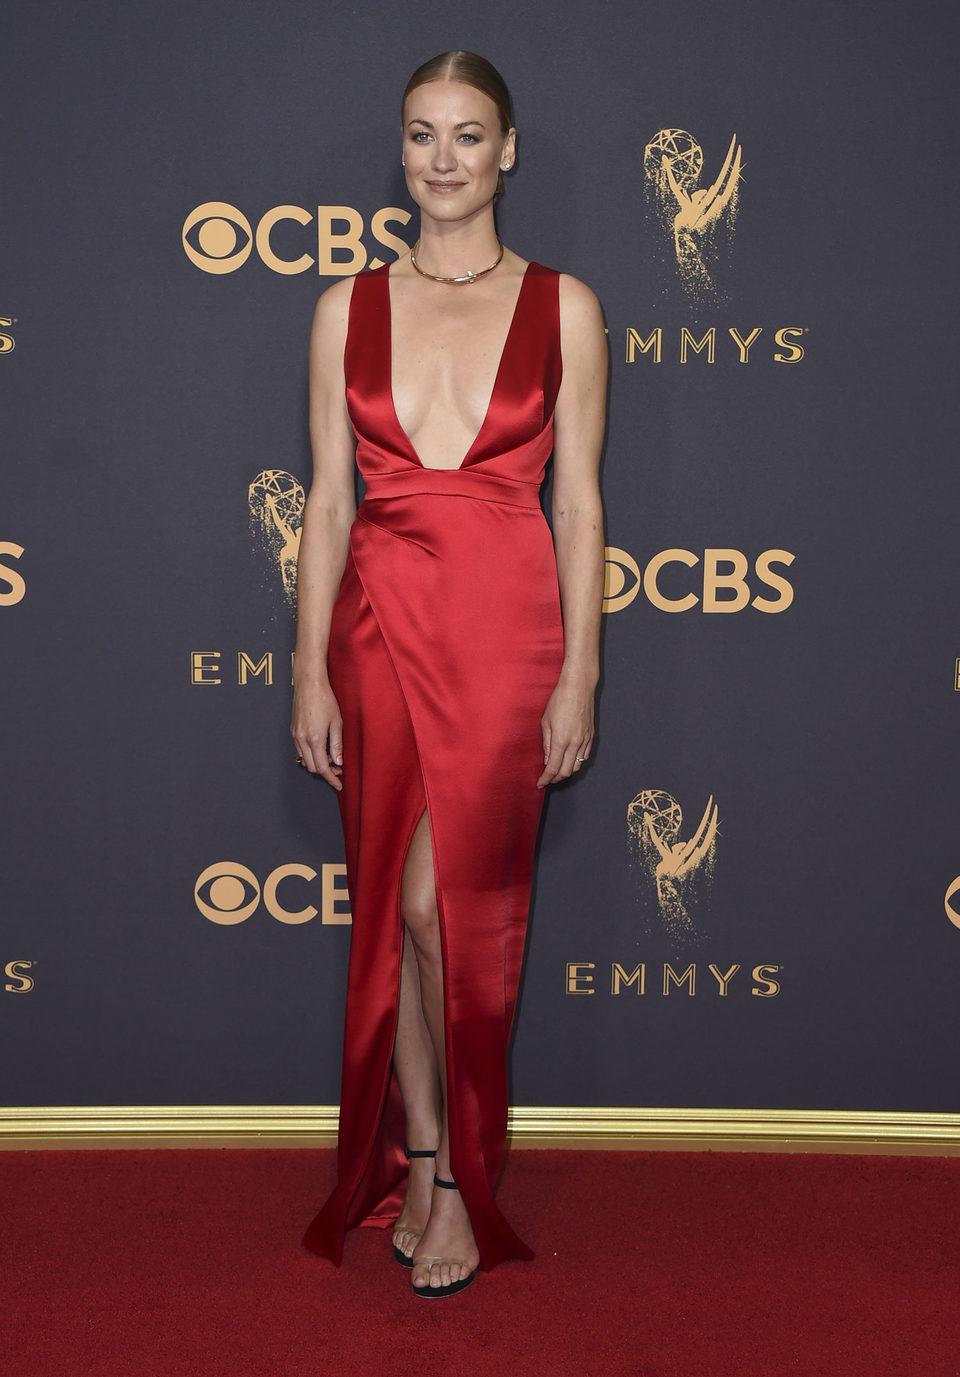 Yvonne Strahovski en la alfombra roja de los Emmy 2017